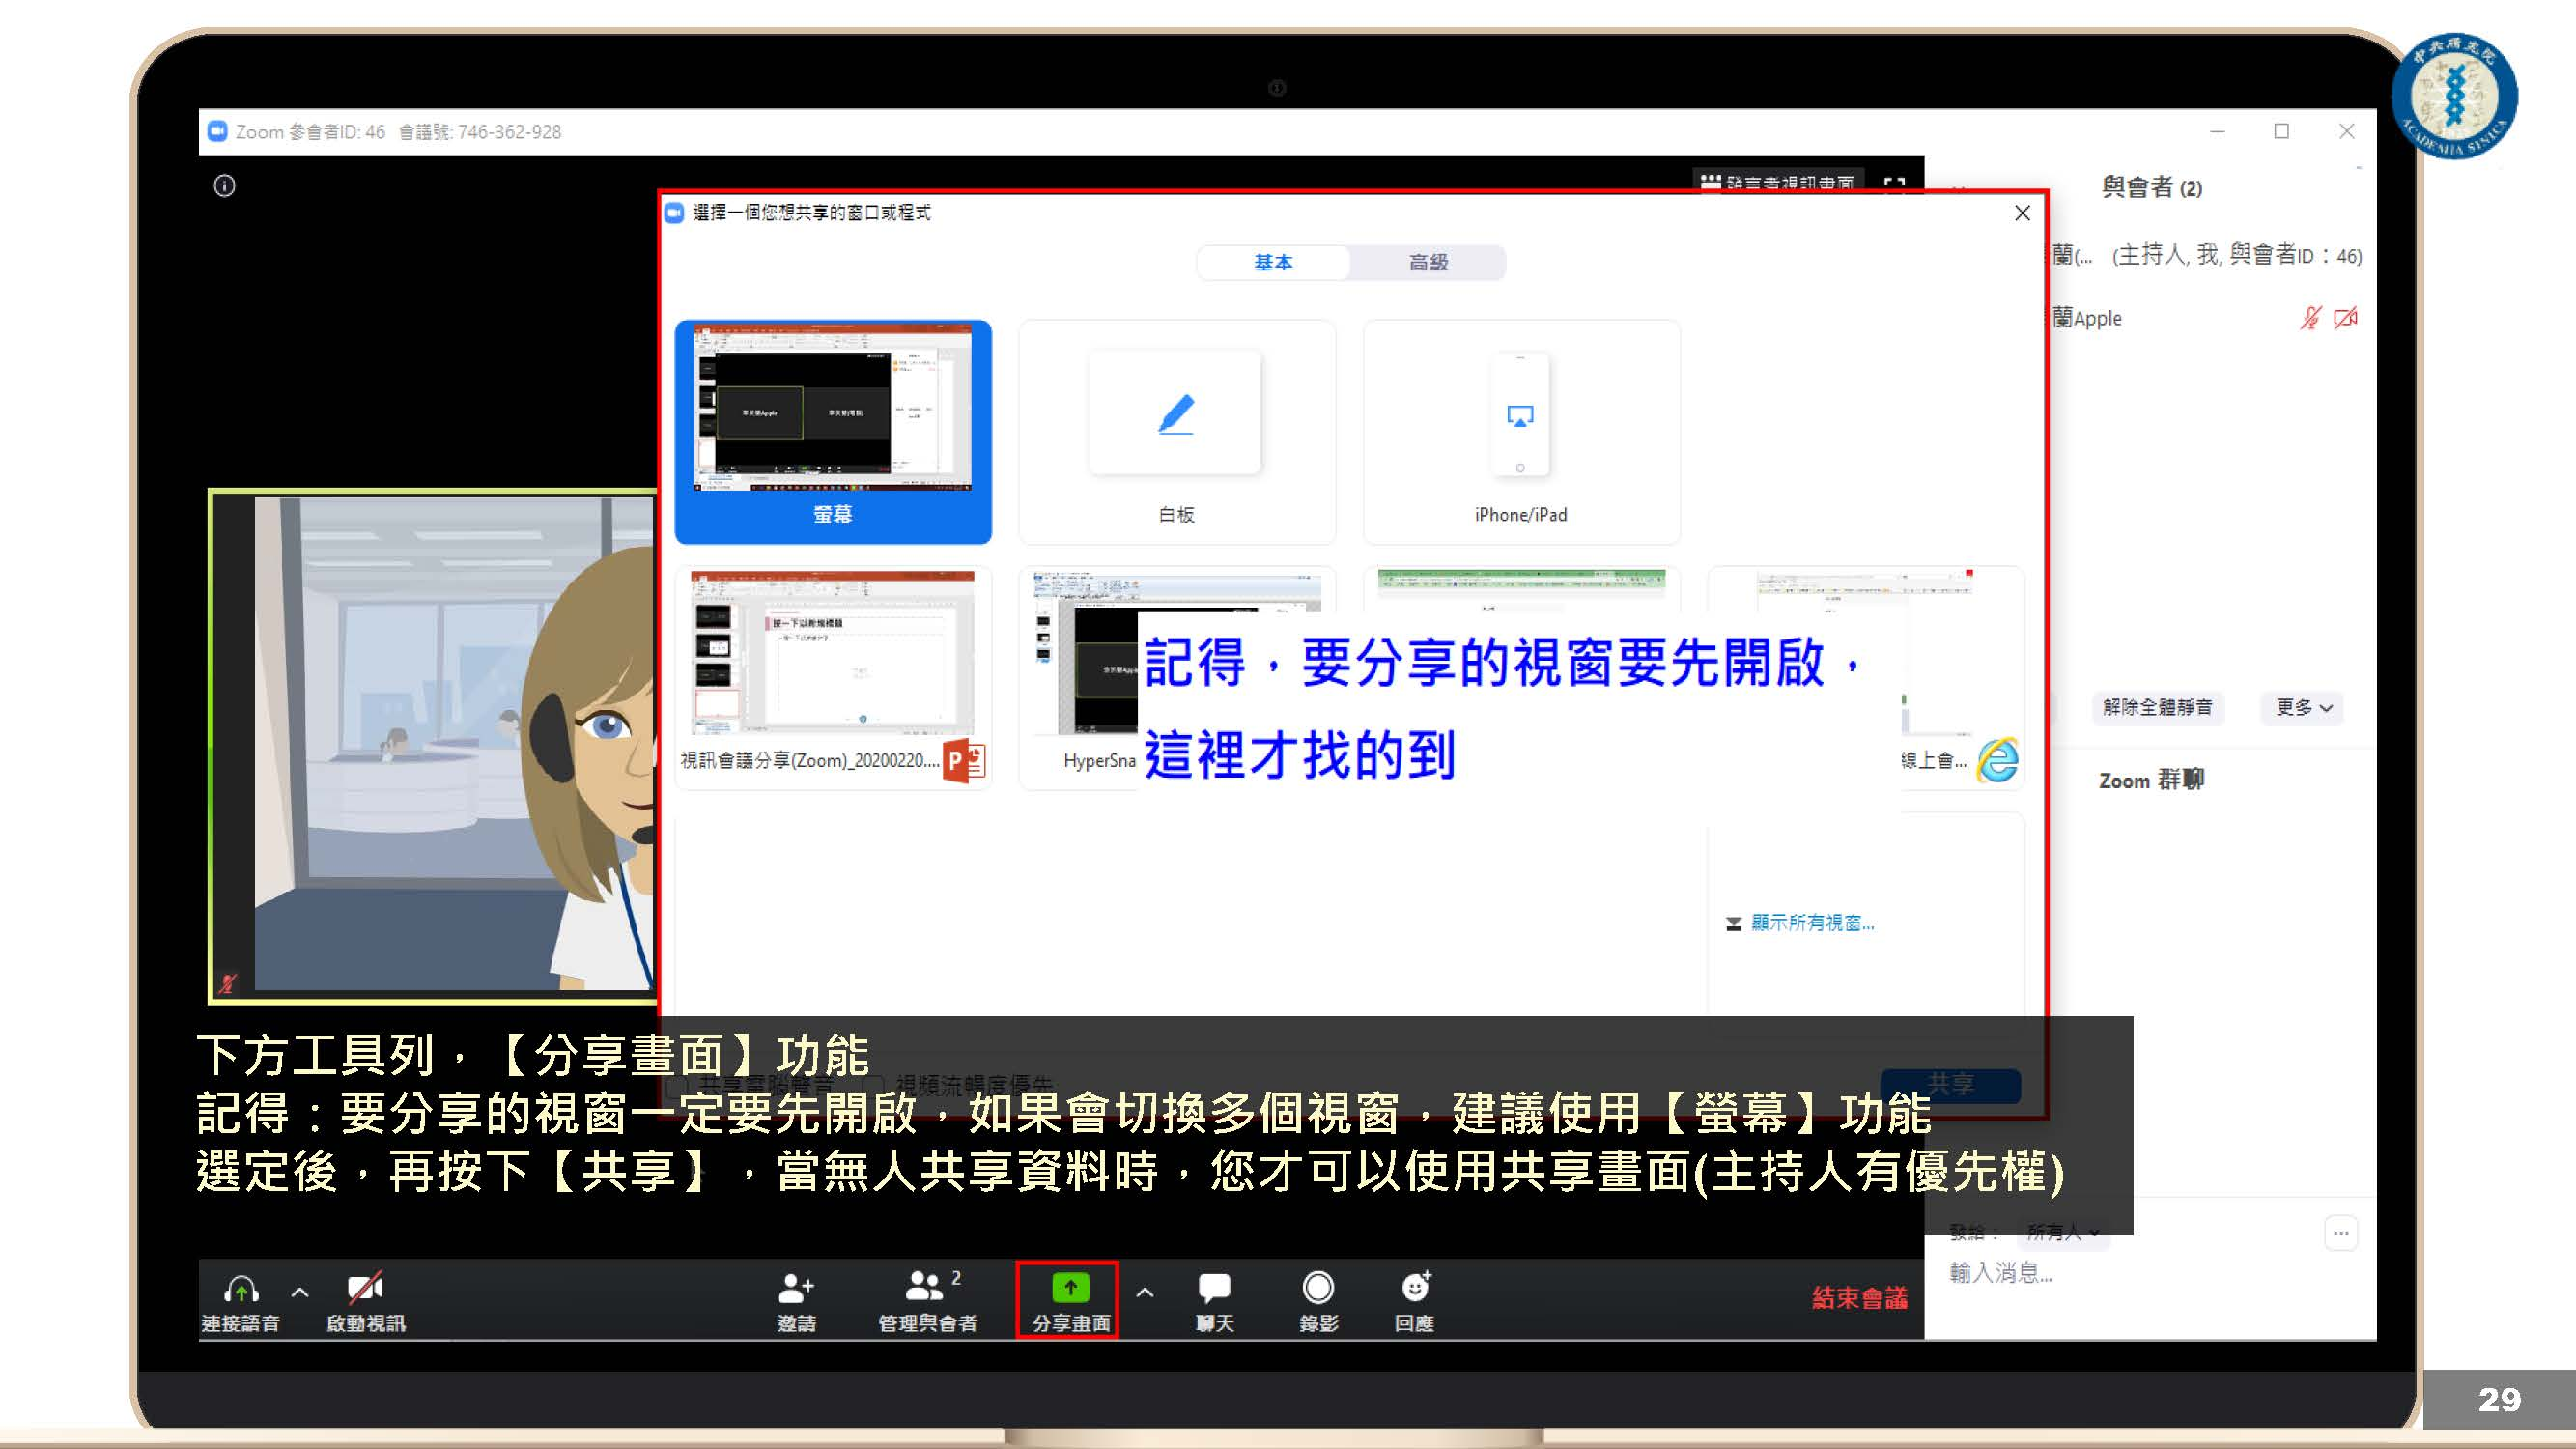 Zoom視訊會議_與會者_操作手冊_頁面_29